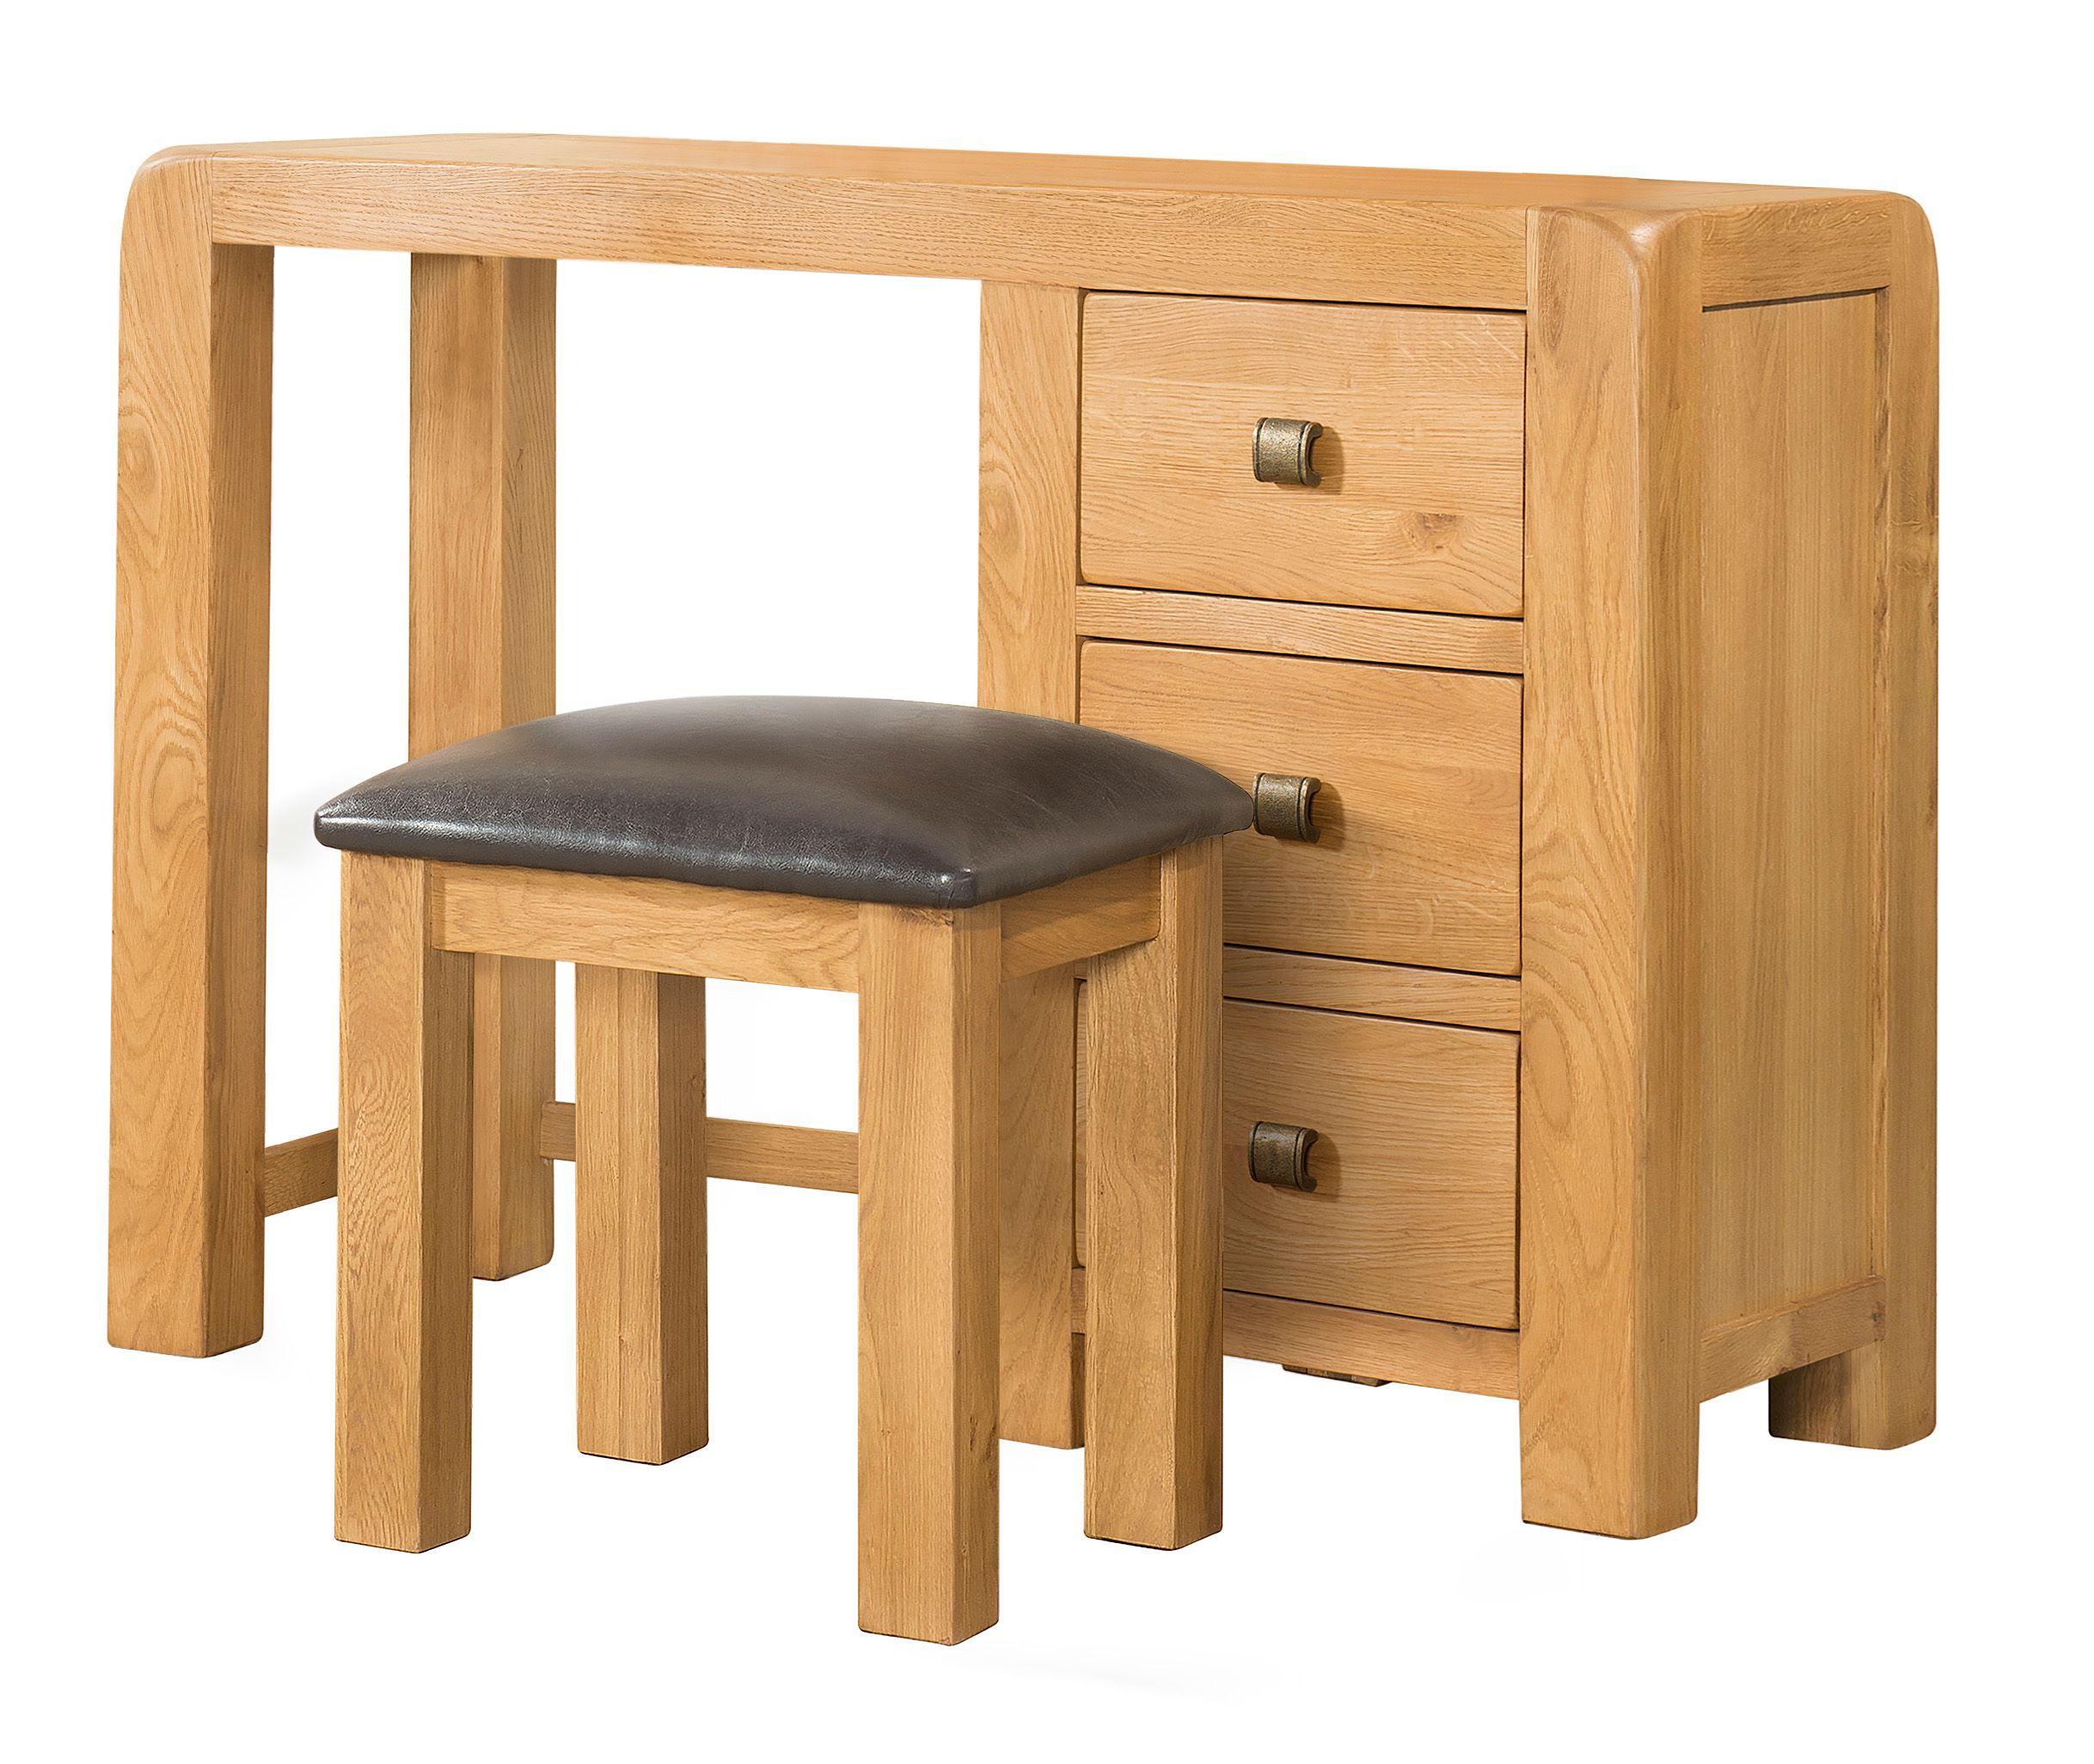 DAVENPORT Dressing Table & Stool